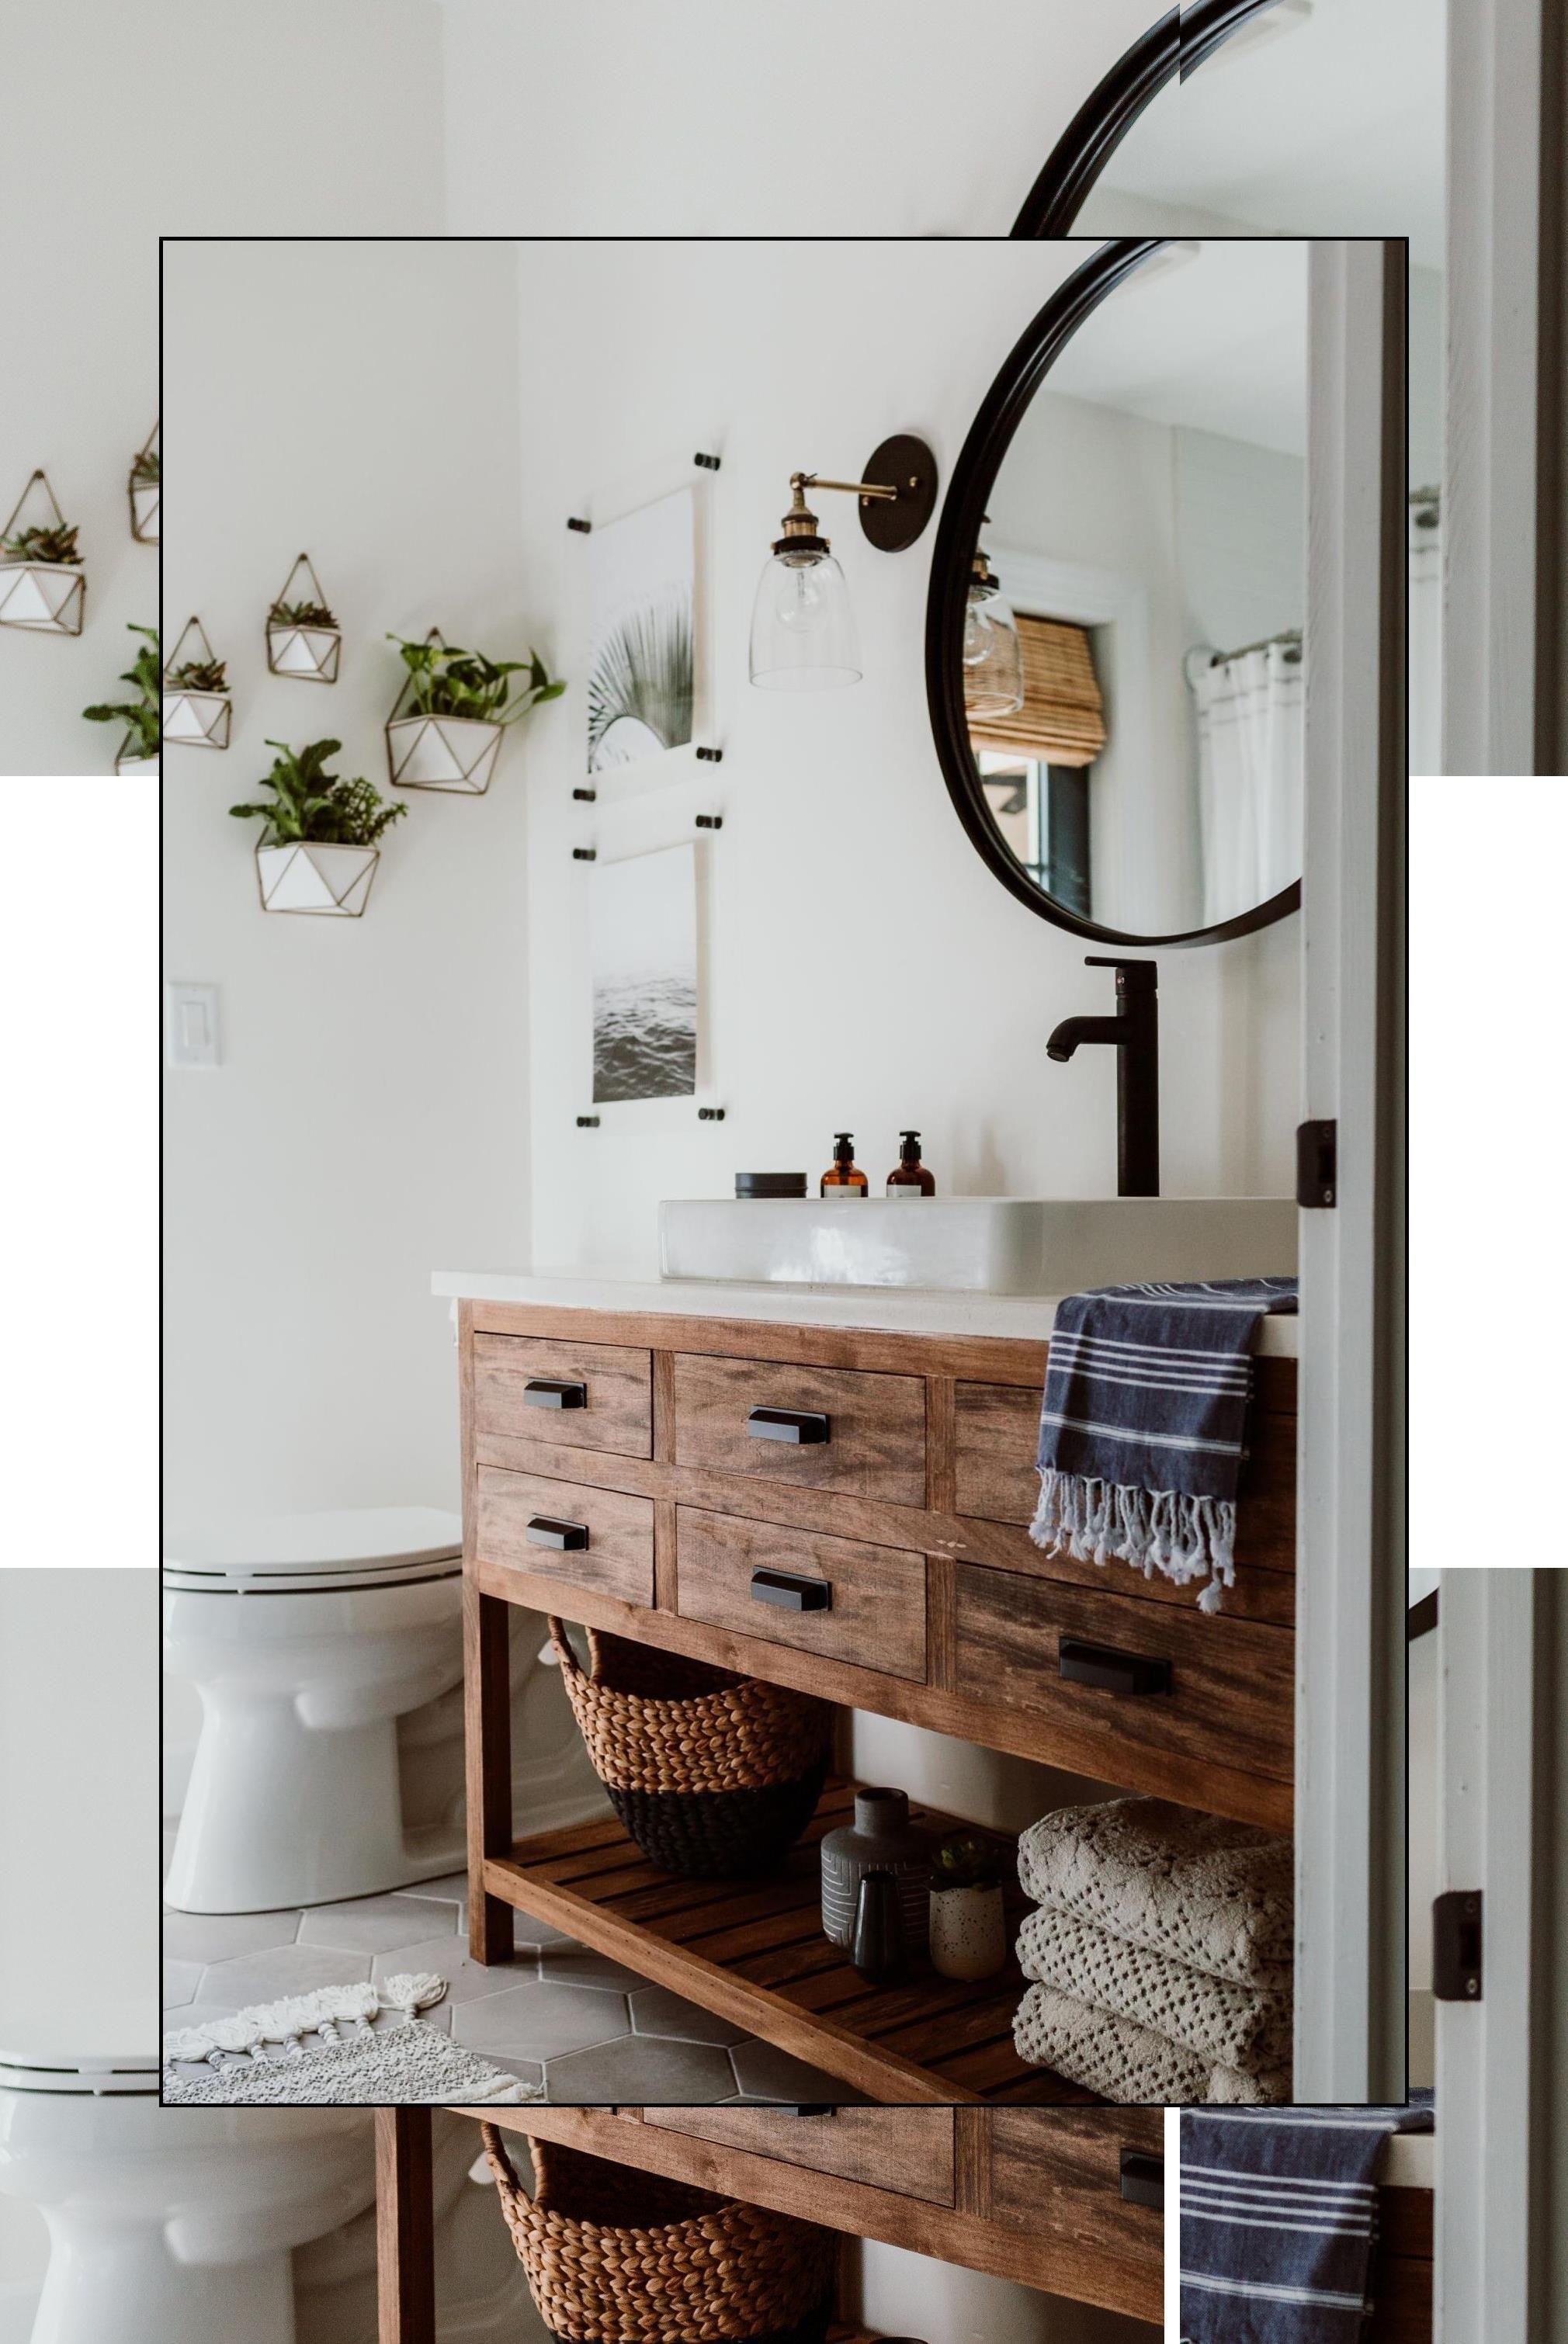 New Bathroom Ideas Rose Gold Bath Accessories Cute Bathroom Decor Ideas Washroom Decor Beautiful Bathroom Decor Bathroom Decor